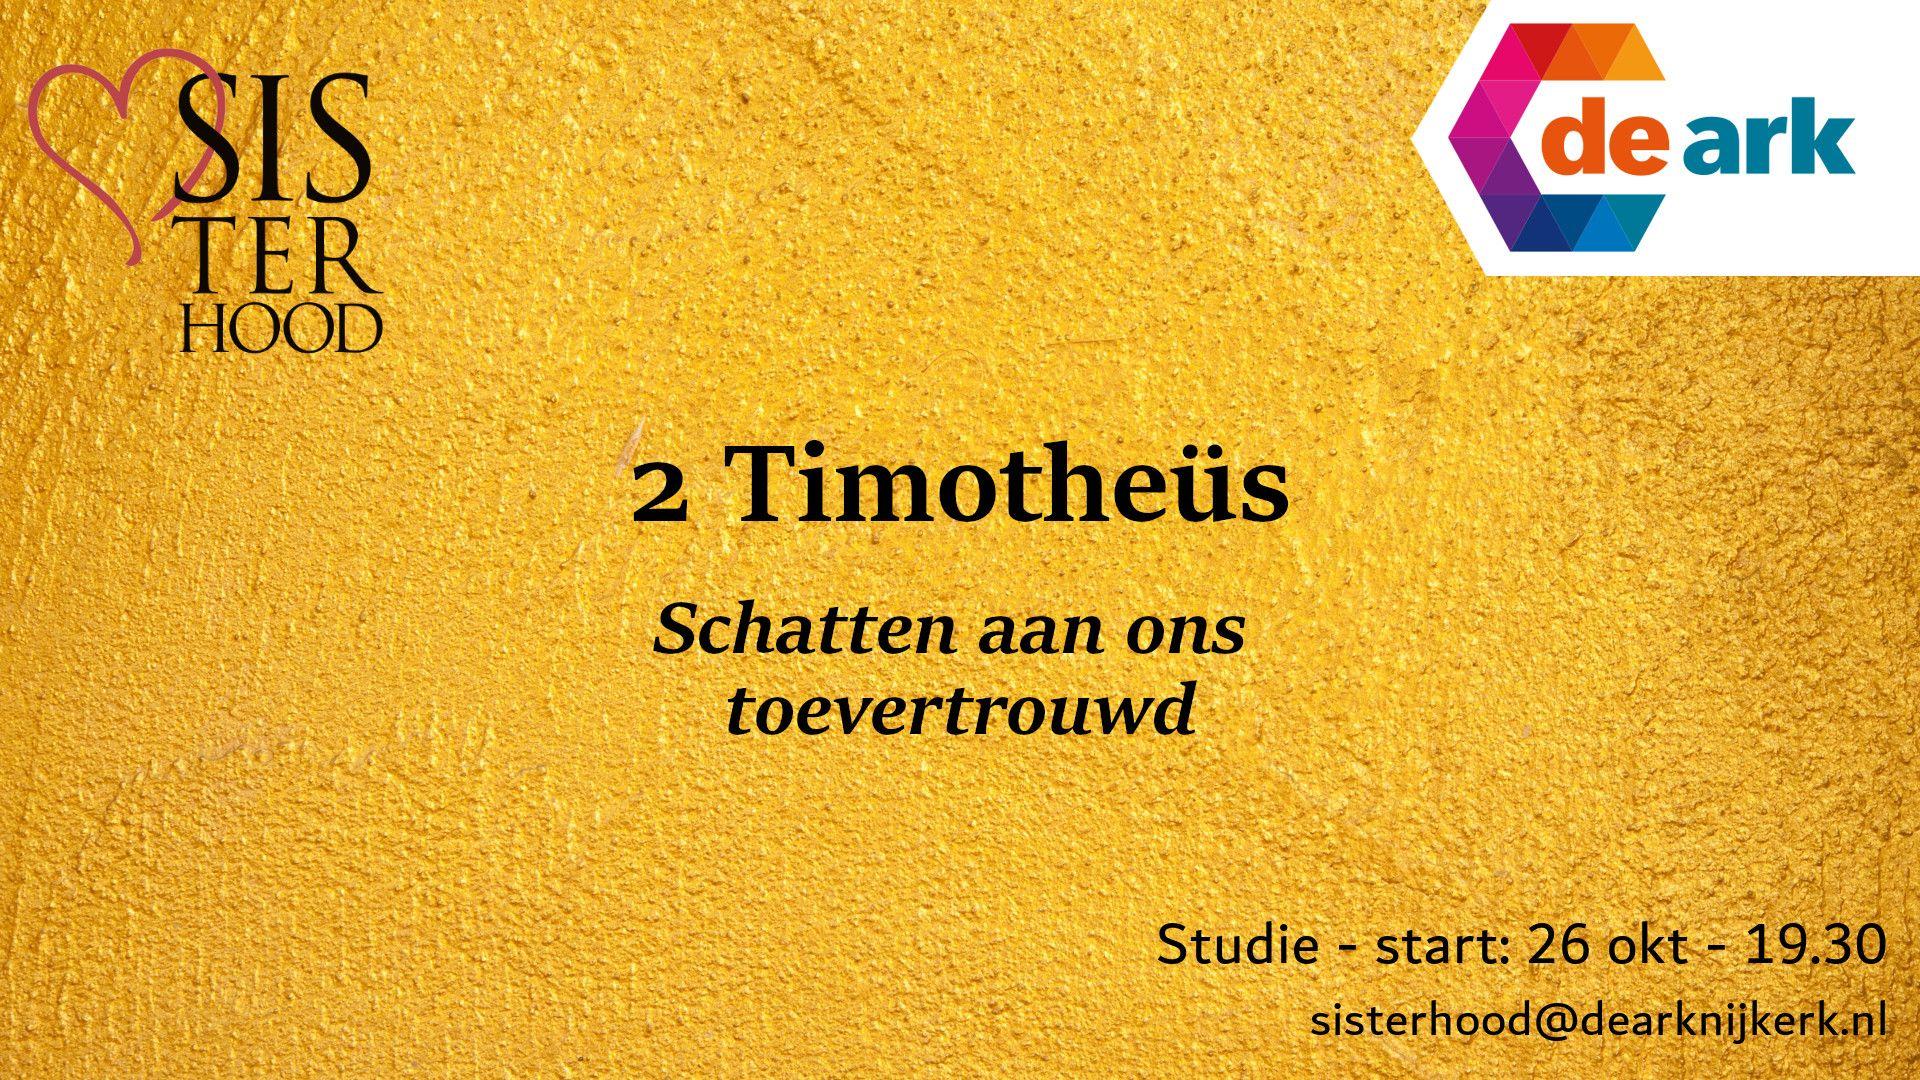 Sisterhood bijbelstudie 2 Timotheüs